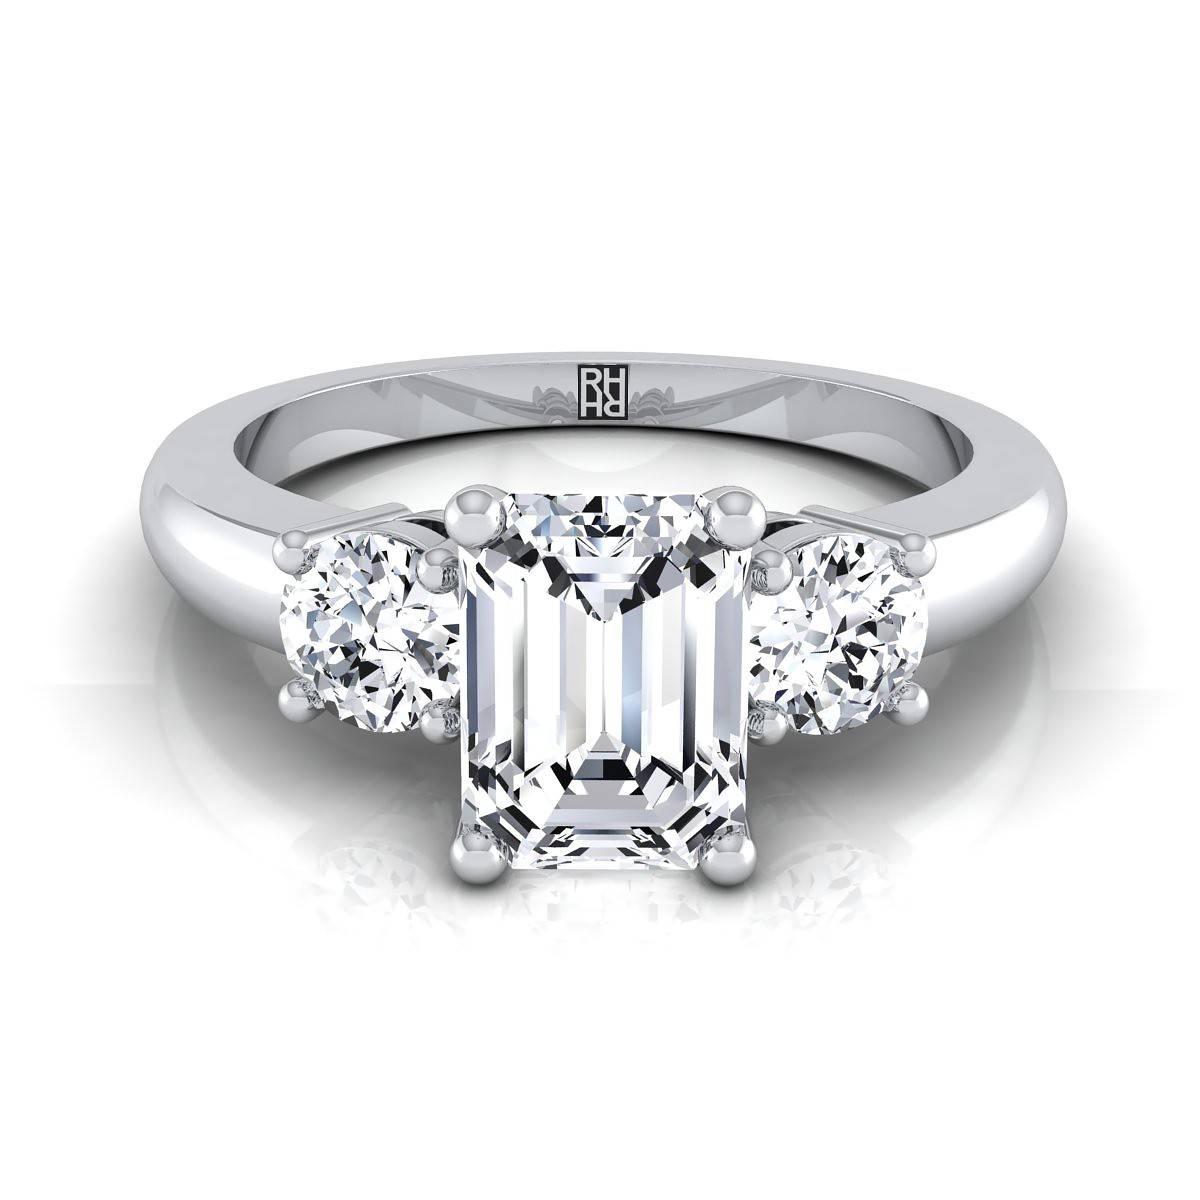 Three Stone Emerald Diamond Center Engagement Ring Platinum | Rockher Regarding 3 Stone Emerald Cut Diamond Engagement Rings (View 14 of 15)